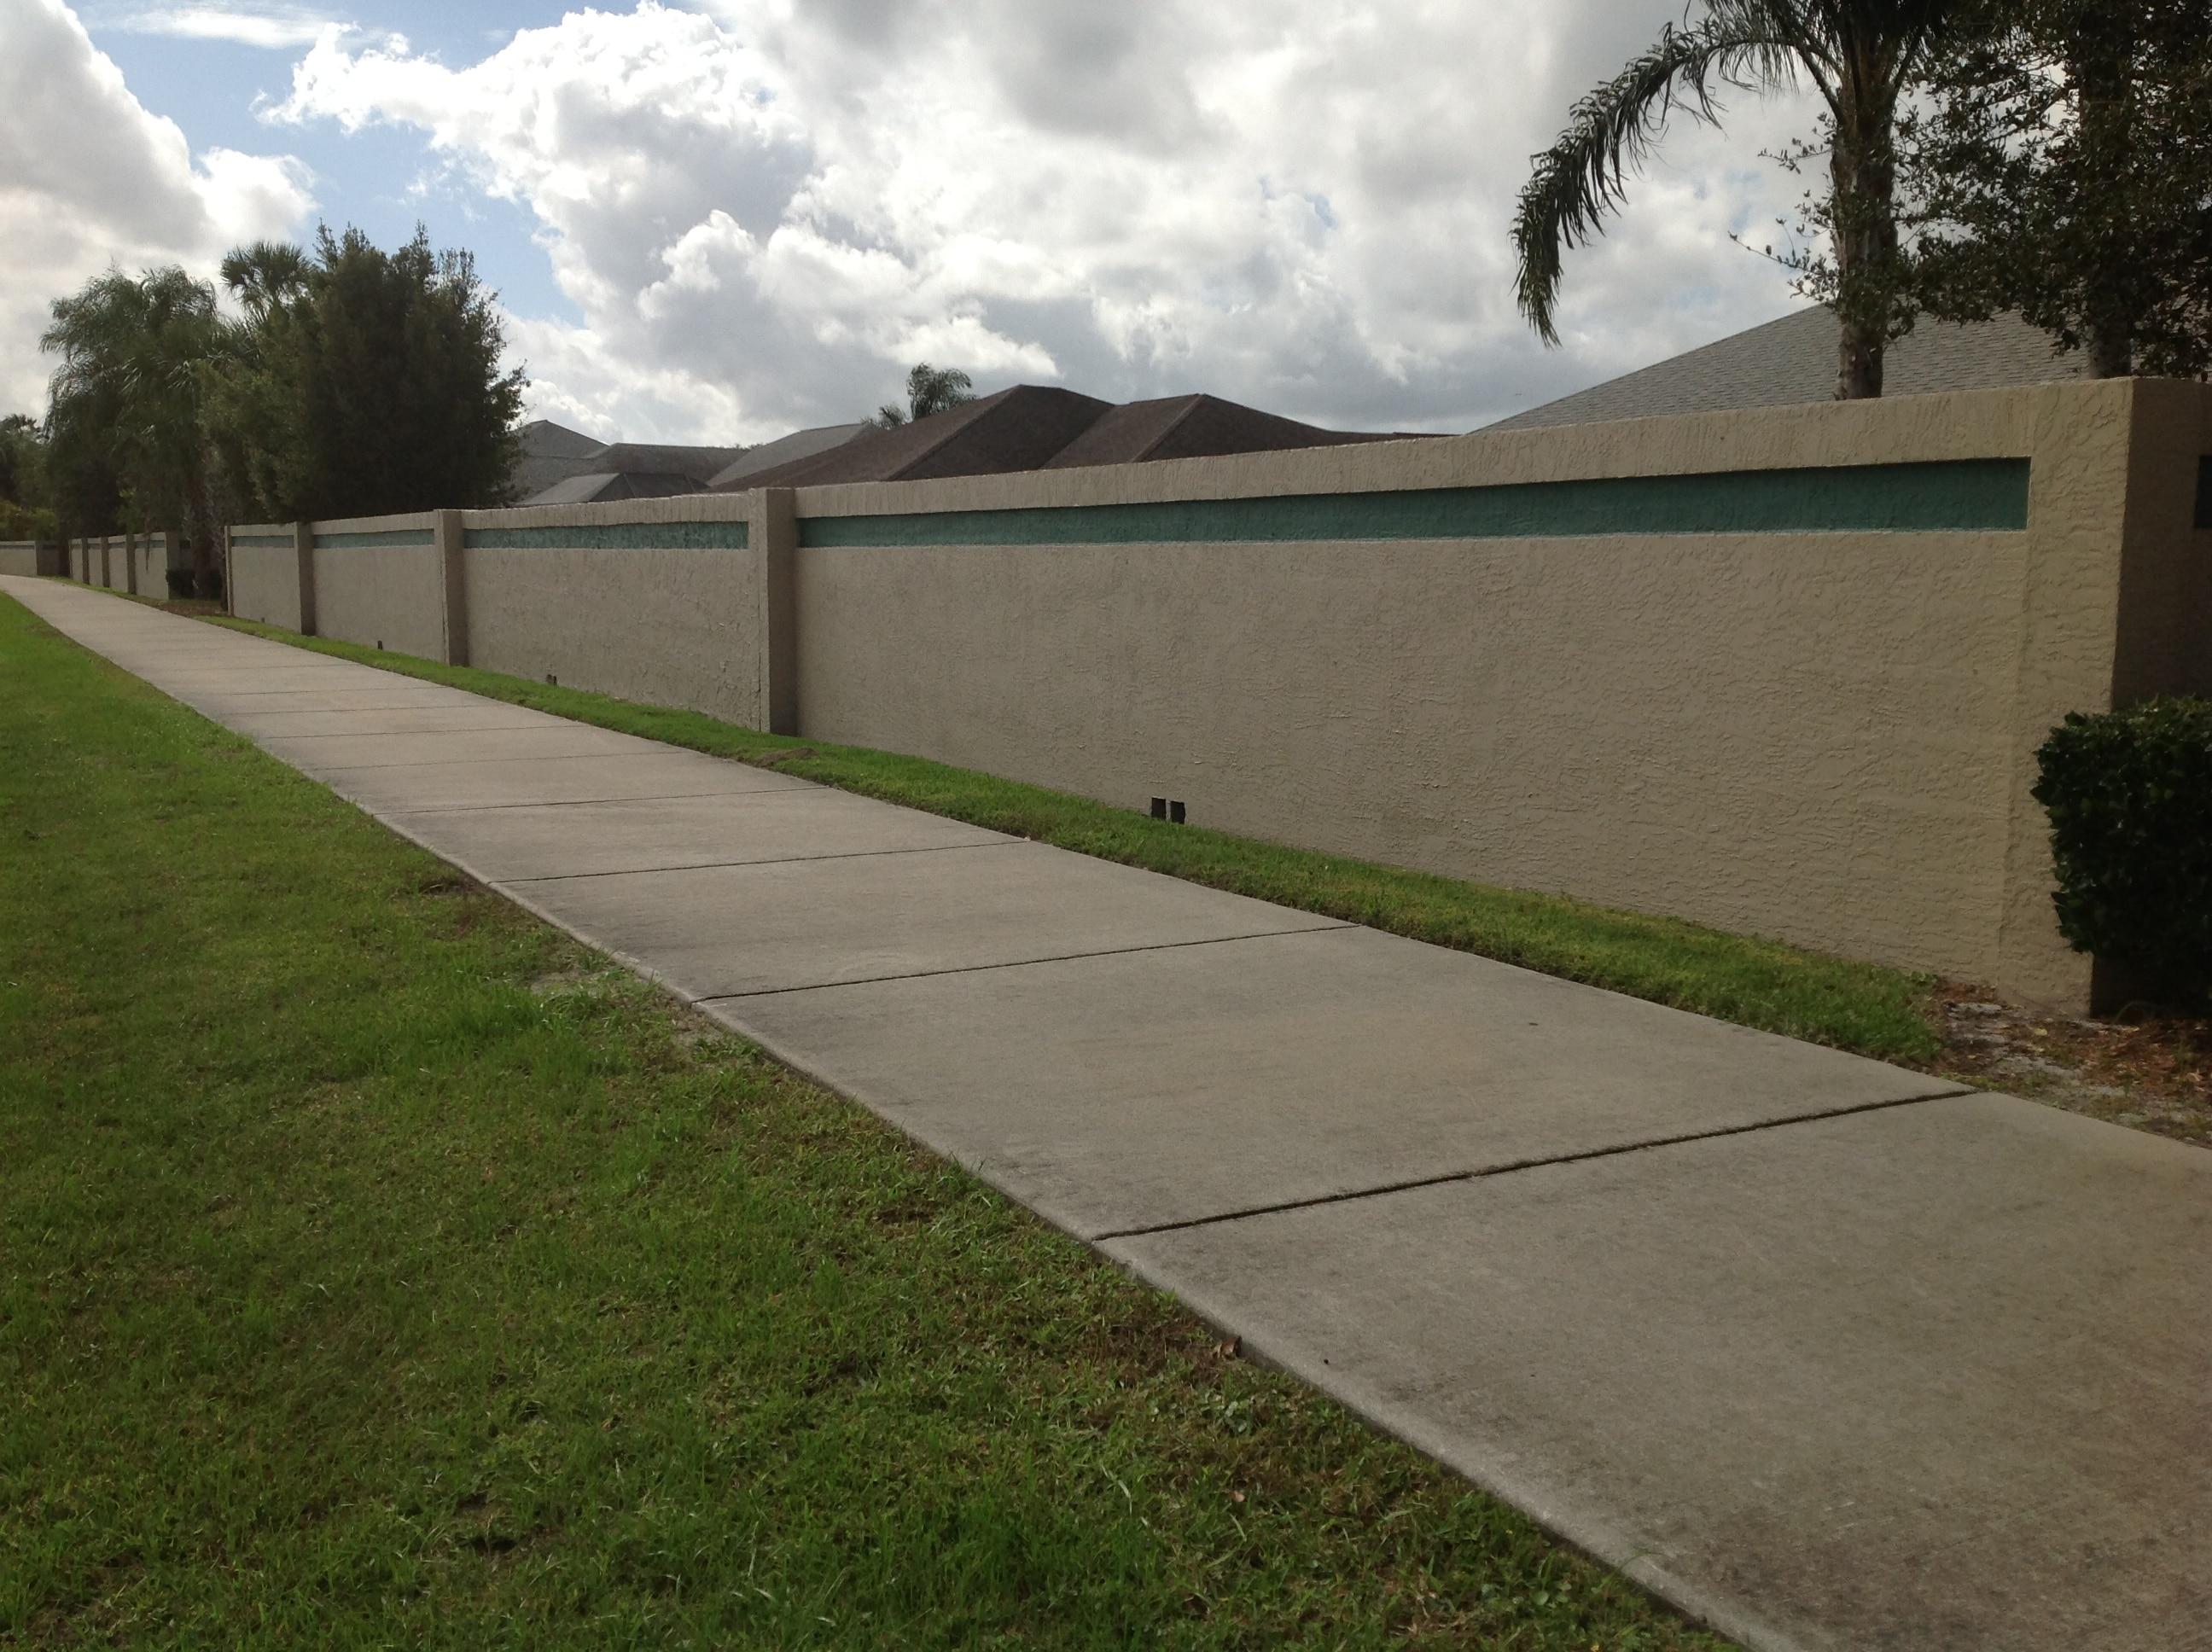 Driveway Concrete Repair Patio Concrete Repair